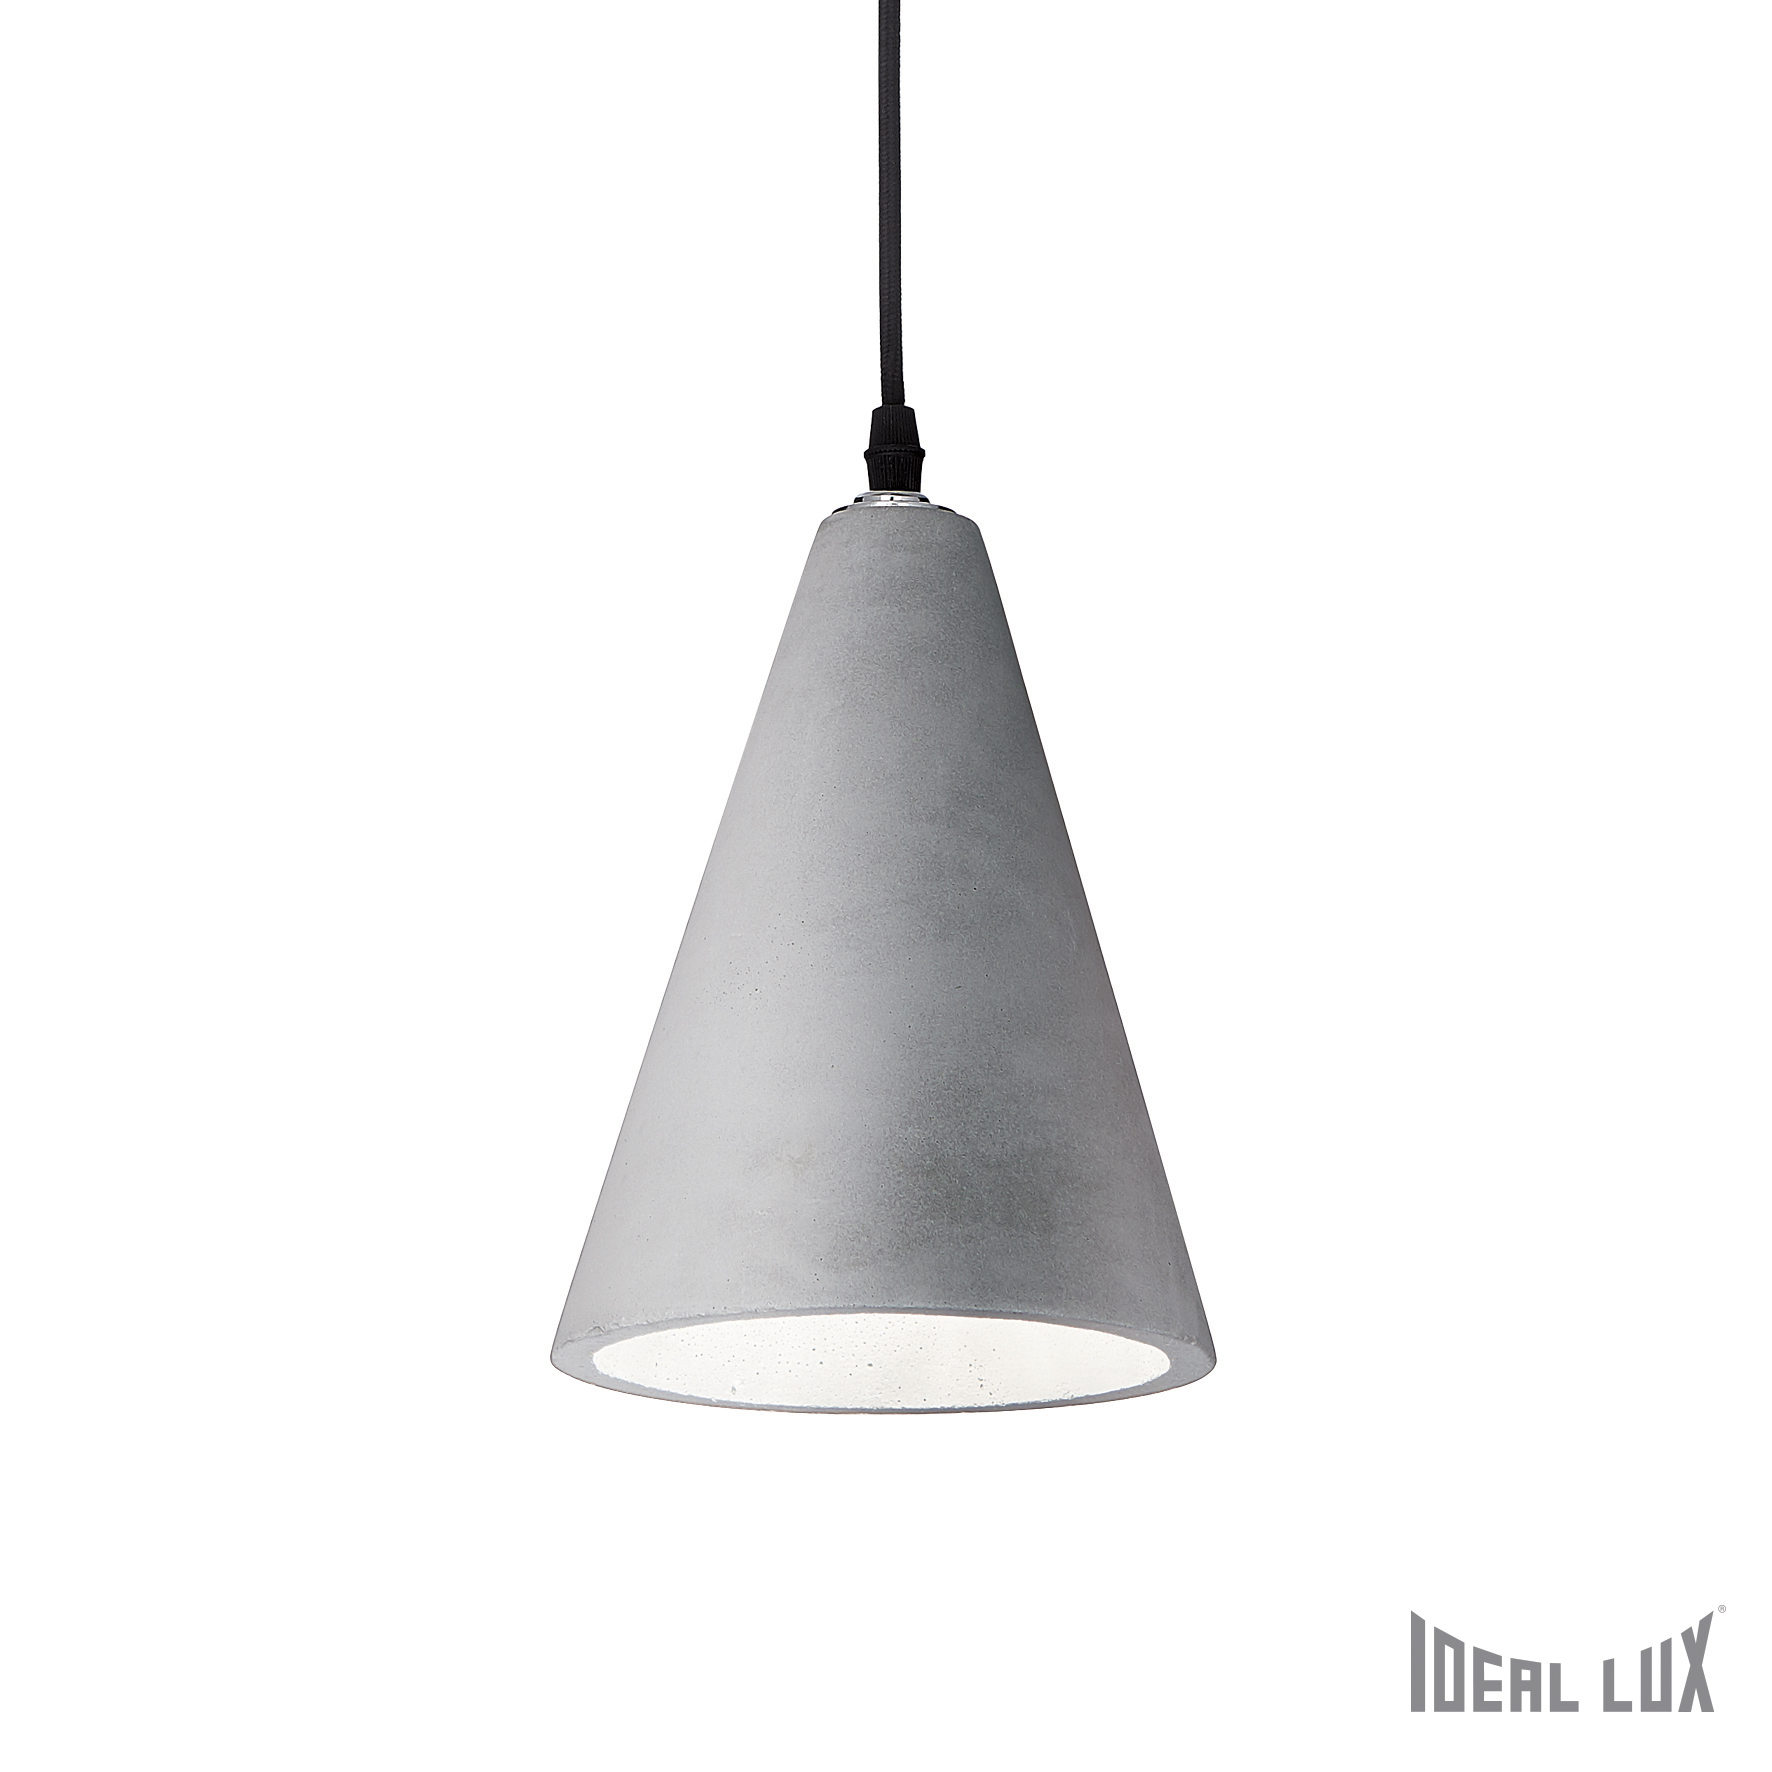 Lustra Oil-2 SP1